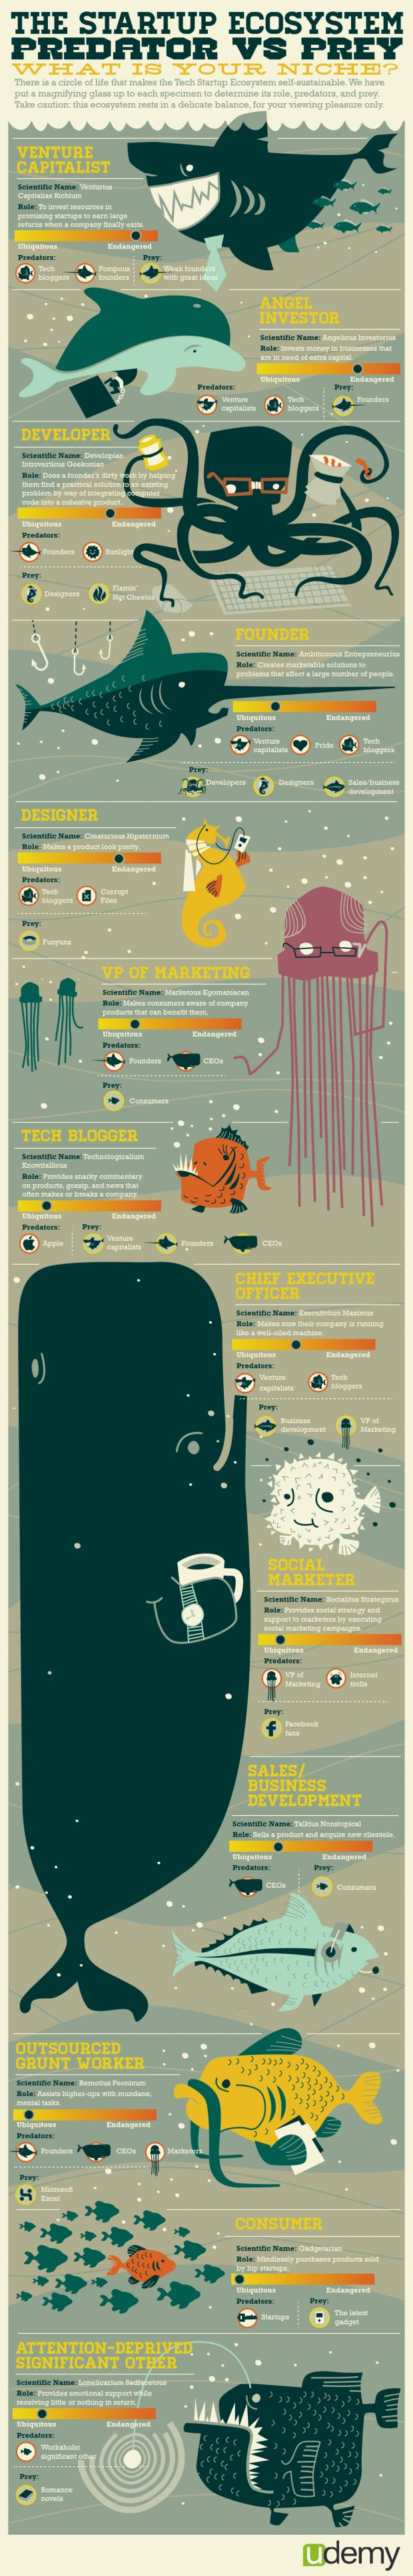 Startup Ecosystem: Predator vs. Prey: Startups Ecosystems, Predator, Sea Creatures, Food Chains, Data Visual, Startupecosystem, Infographics, Info Graphics, Design